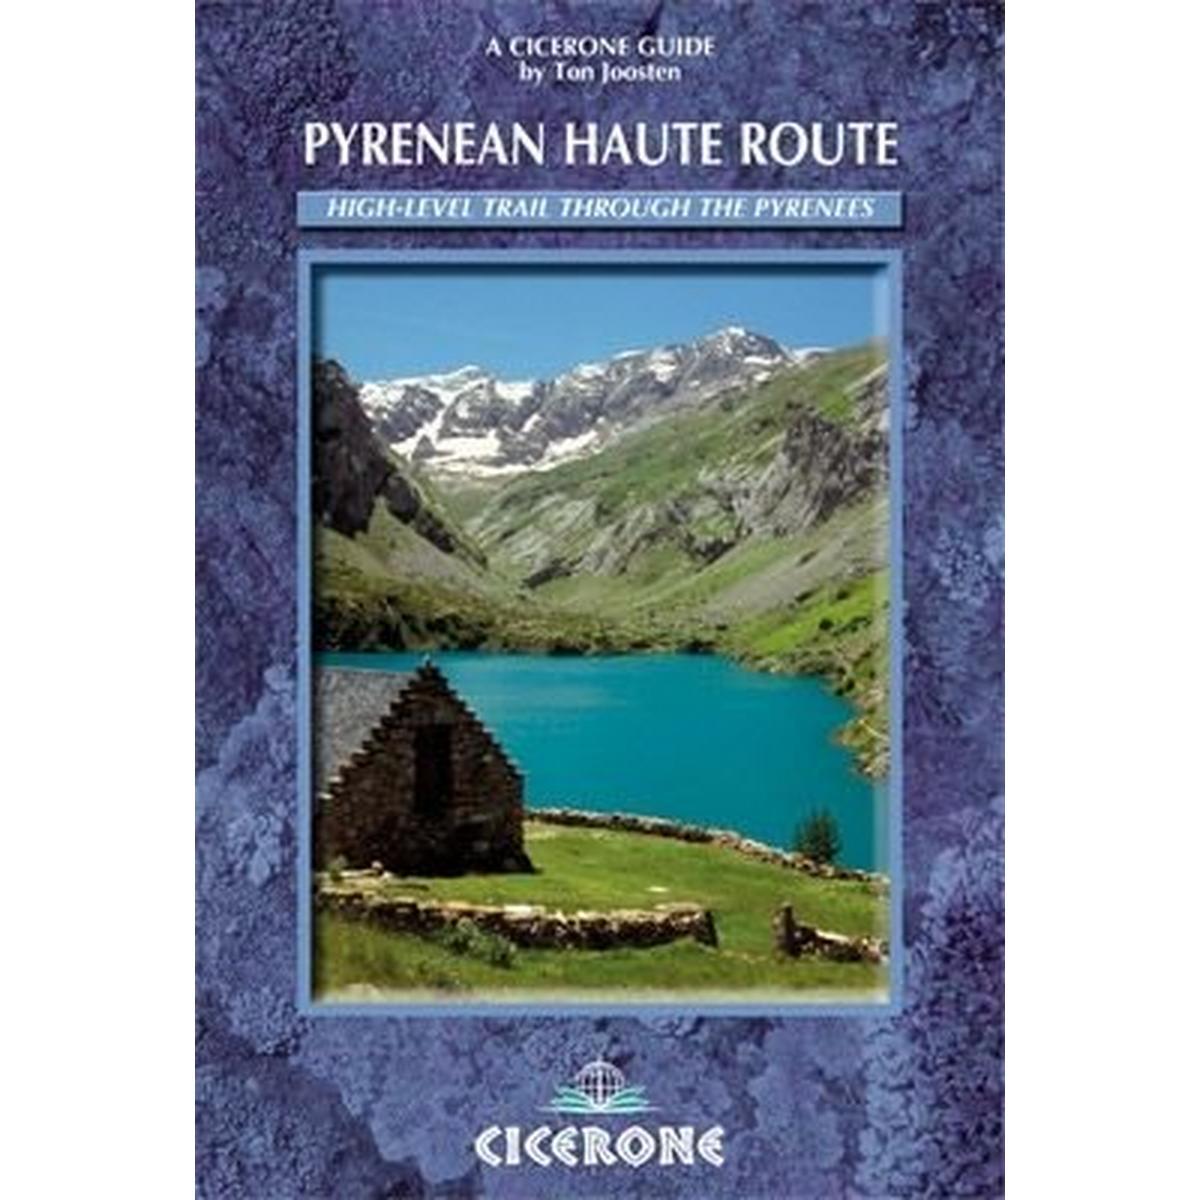 Cicerone Pyrenean Haute Route